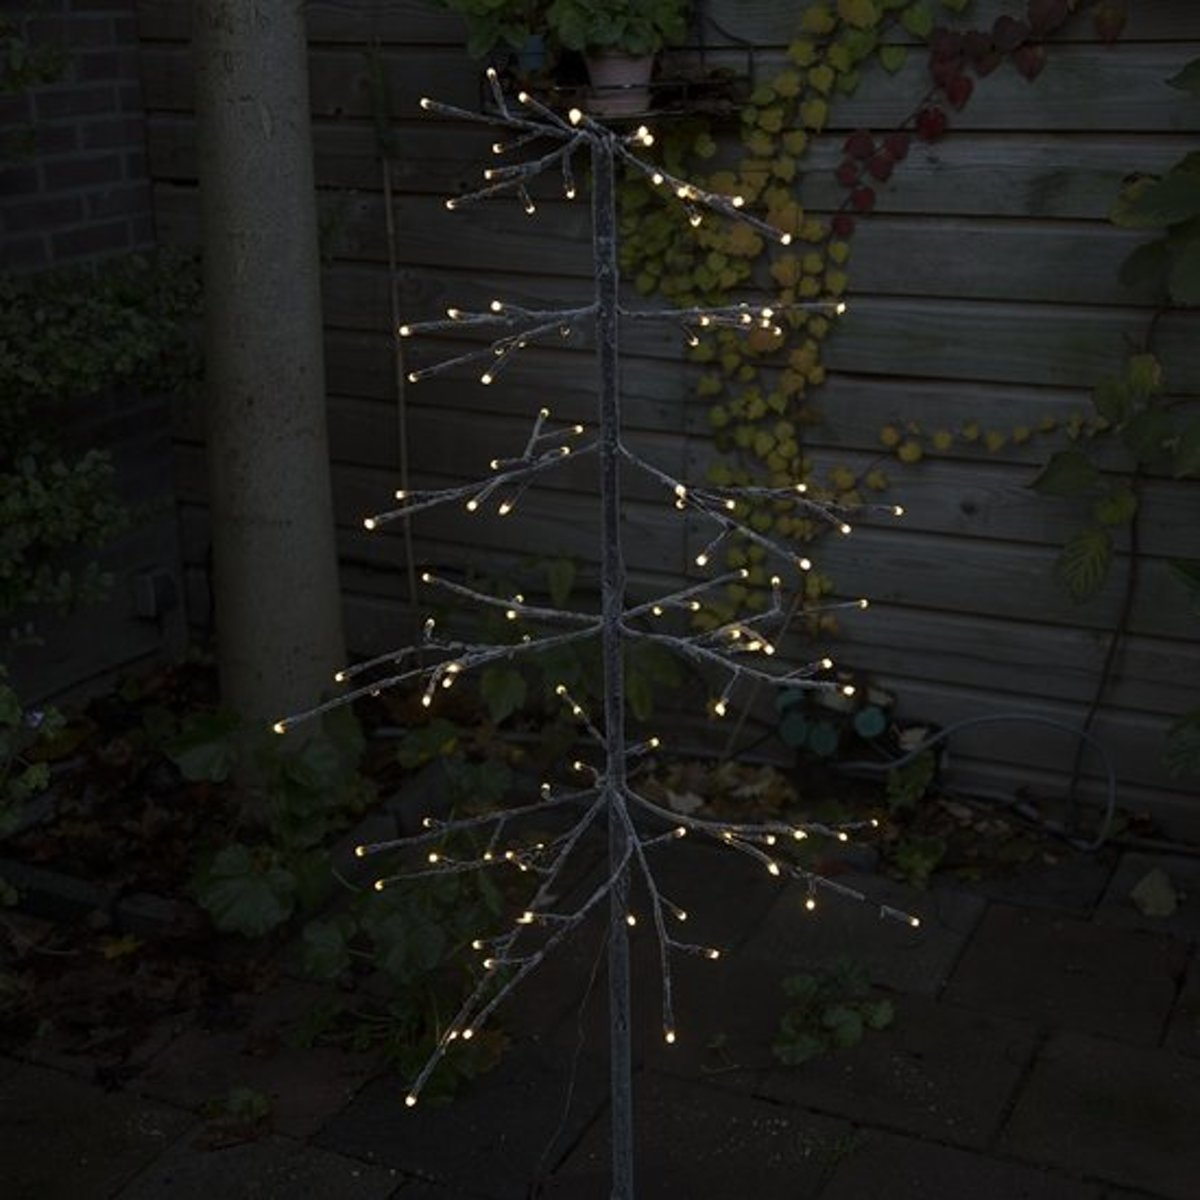 Kerstverlichting dennenboom Snow LED warm wit 1,2 meter kopen